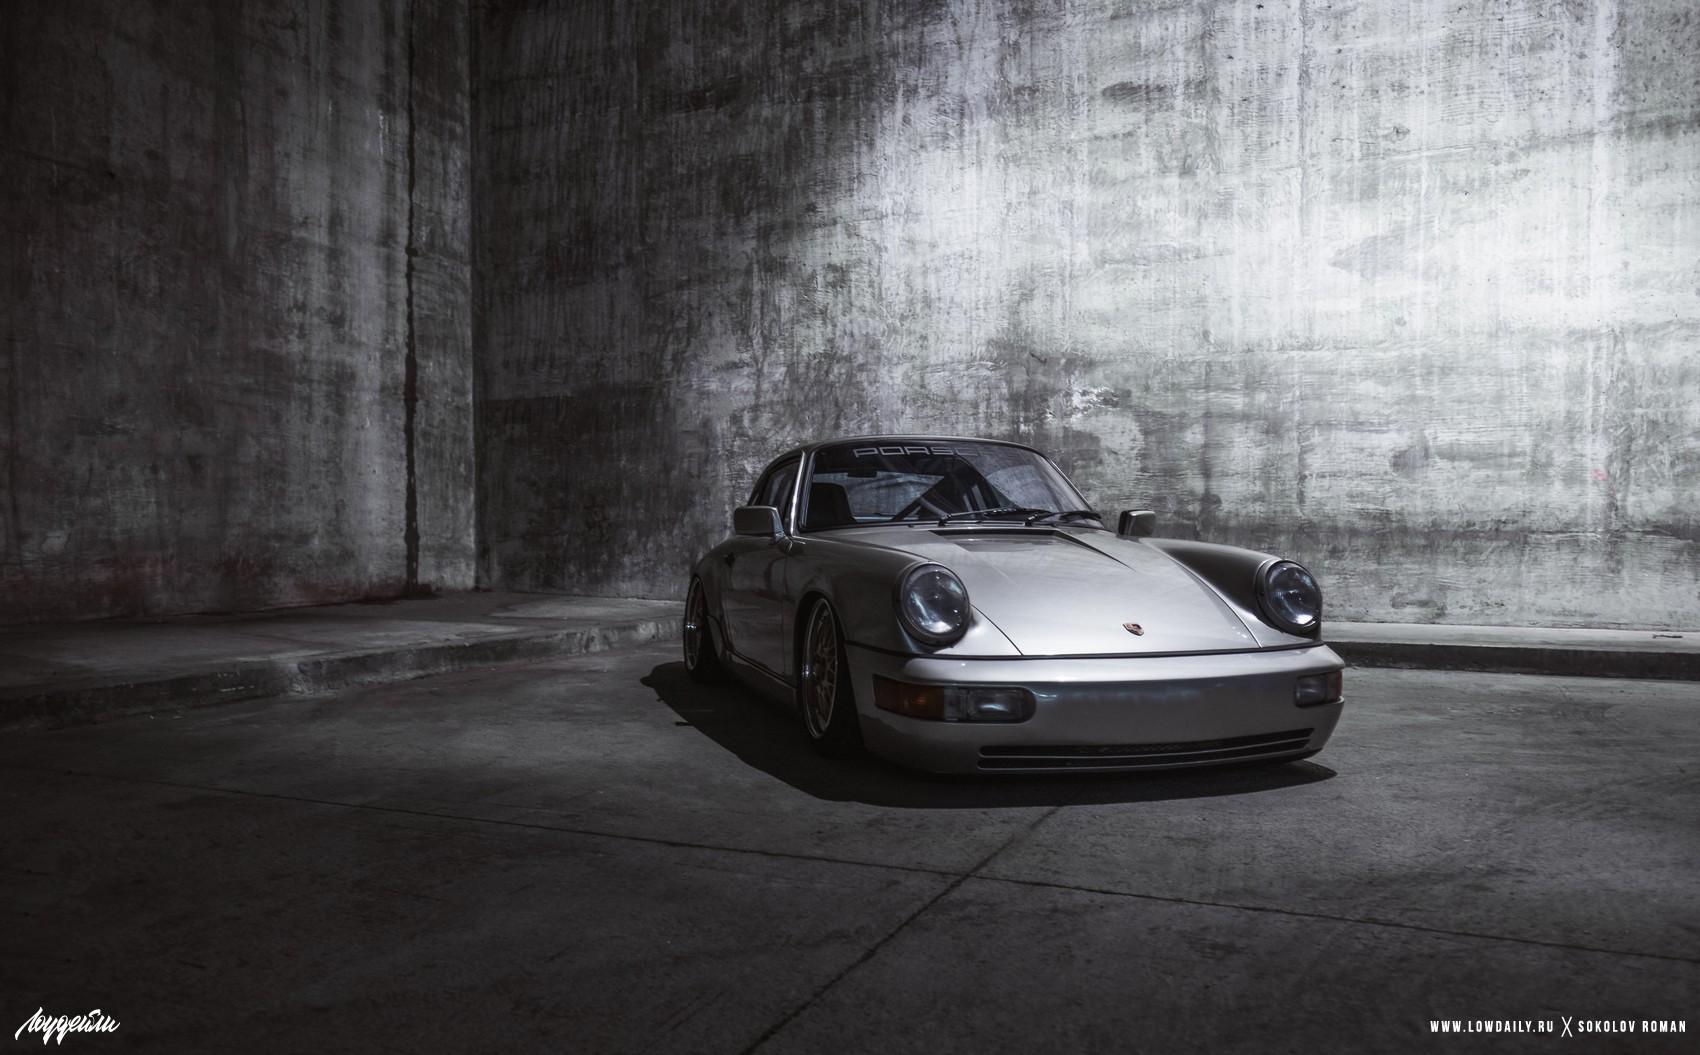 1989 Porsche Carrera 4 (964) DSCF3261